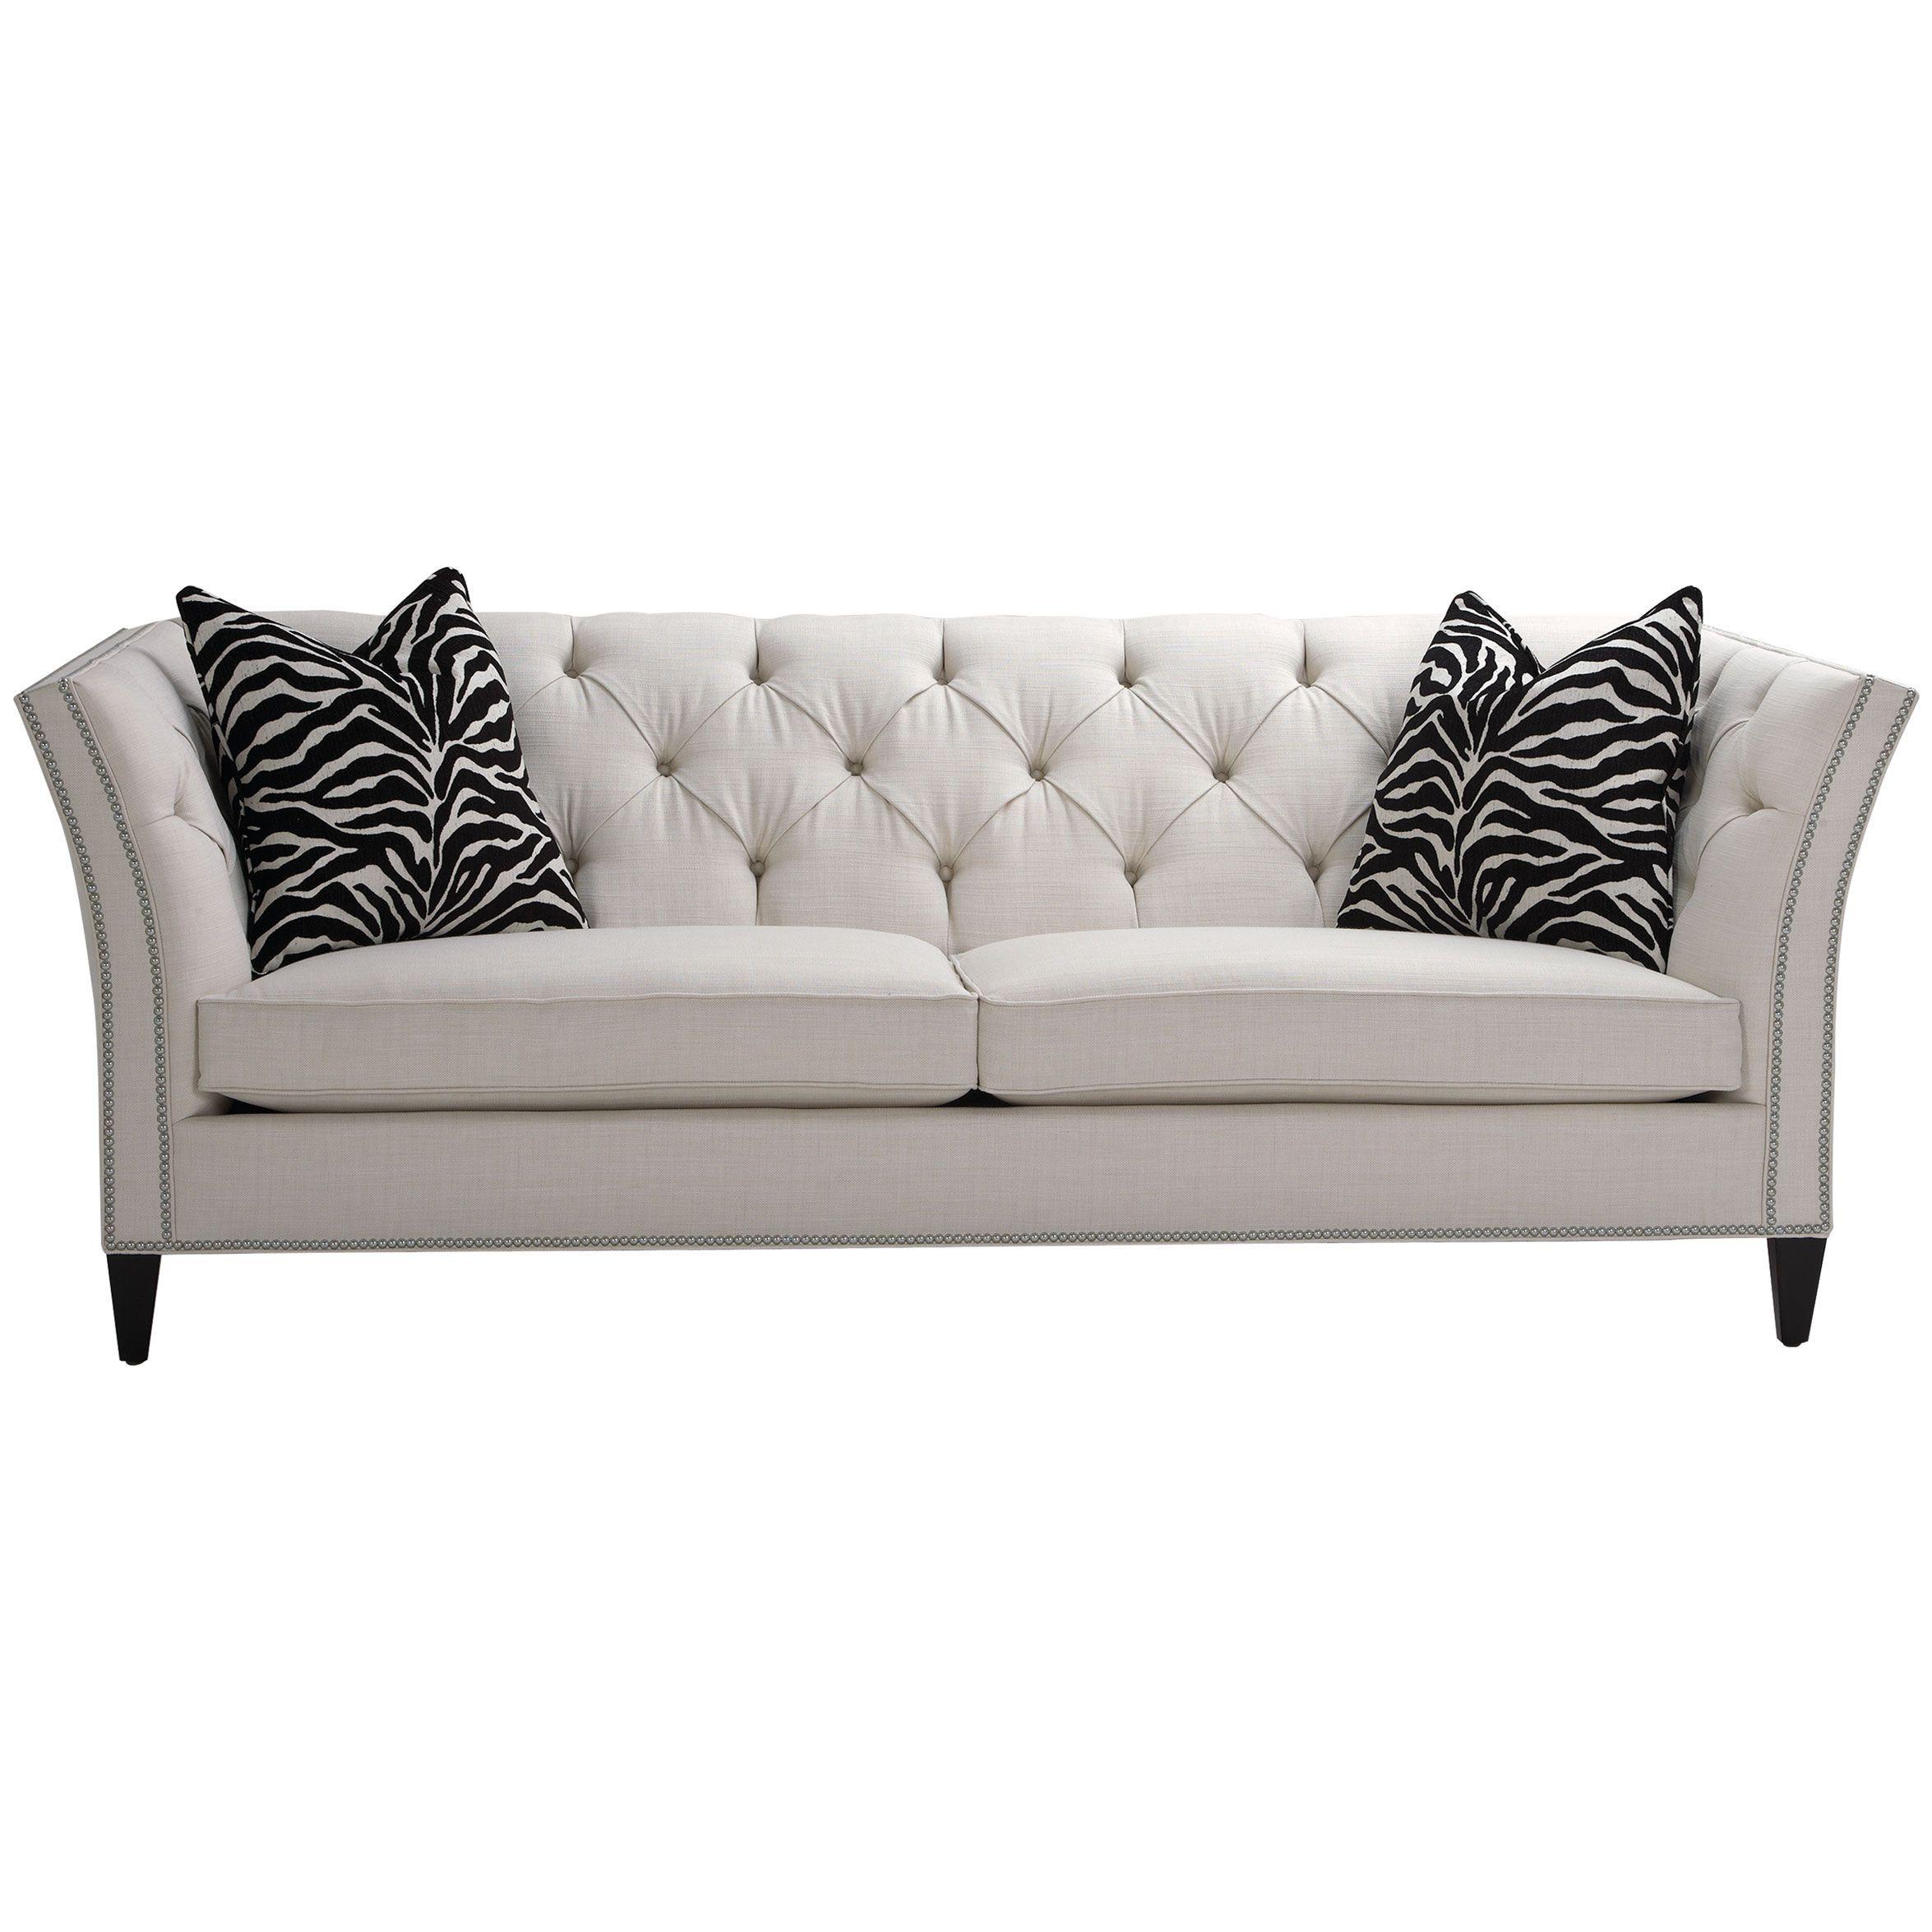 Design Trend Black And White Shelton Sofa Ethan Allen